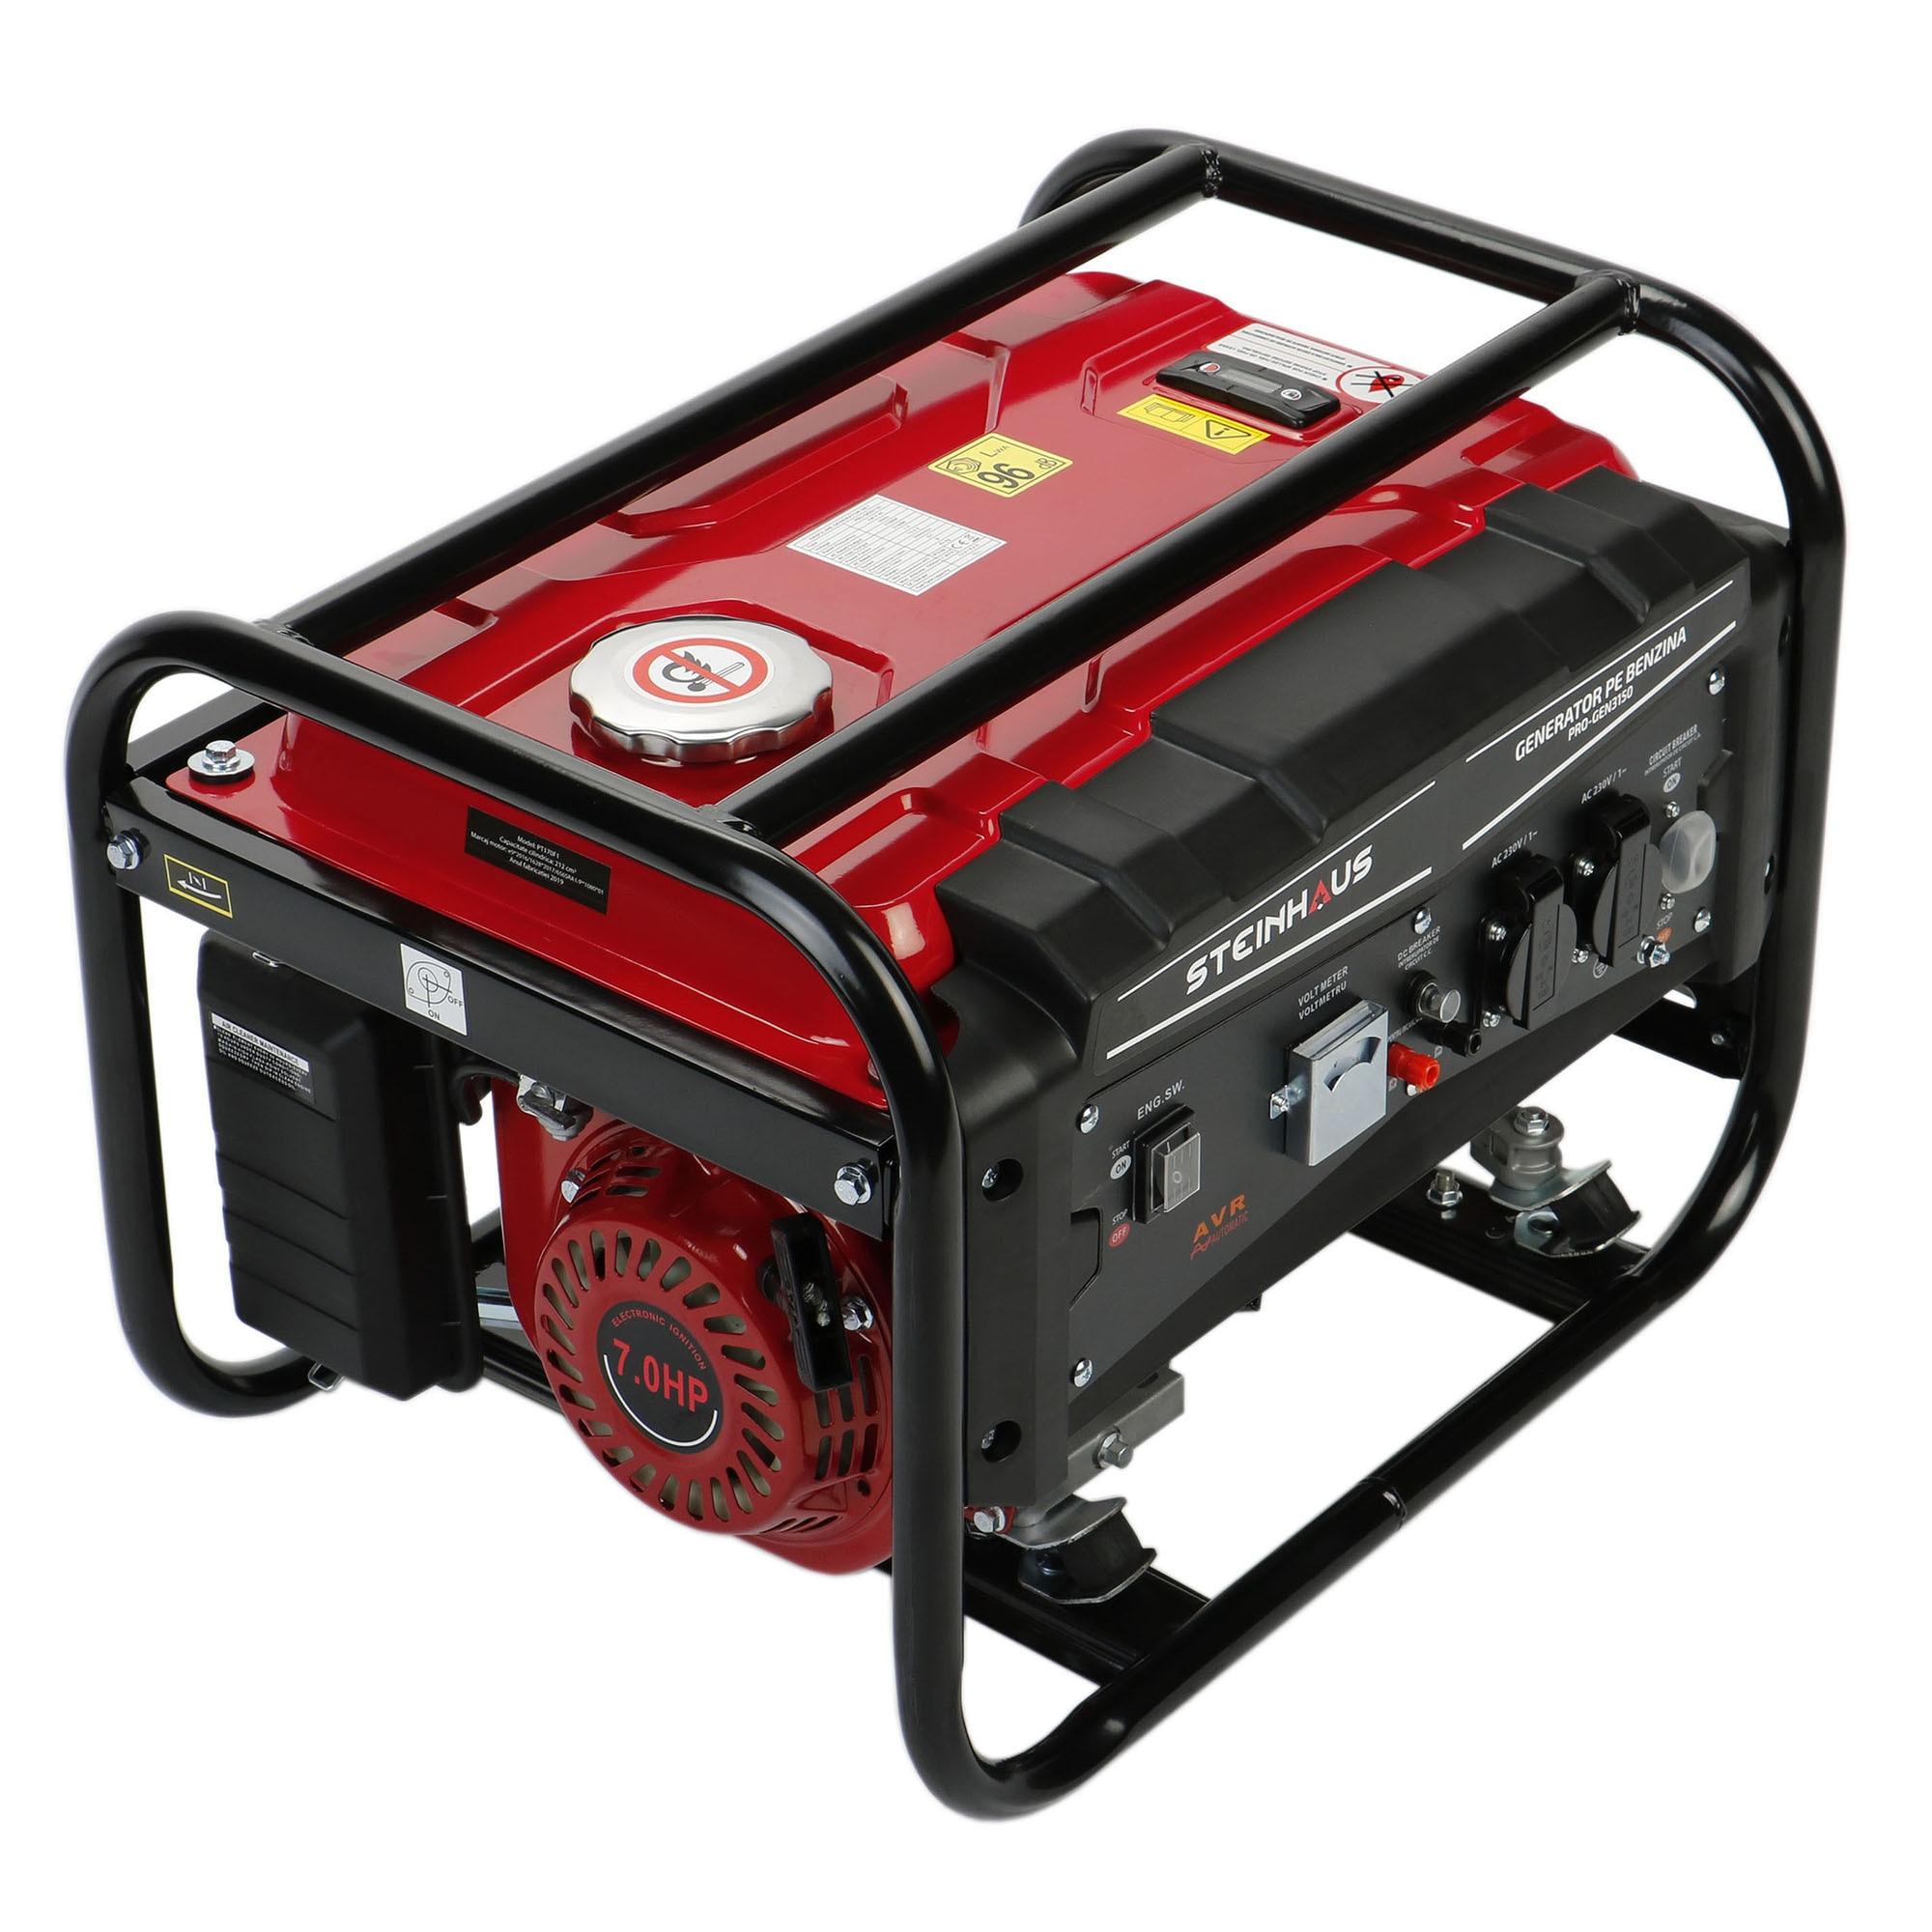 Fotografie Generator curent electric Steinhaus PRO-GEN3150, 3150 W cu stabilizator de tensiune, benzina, autonomie 9.8 h